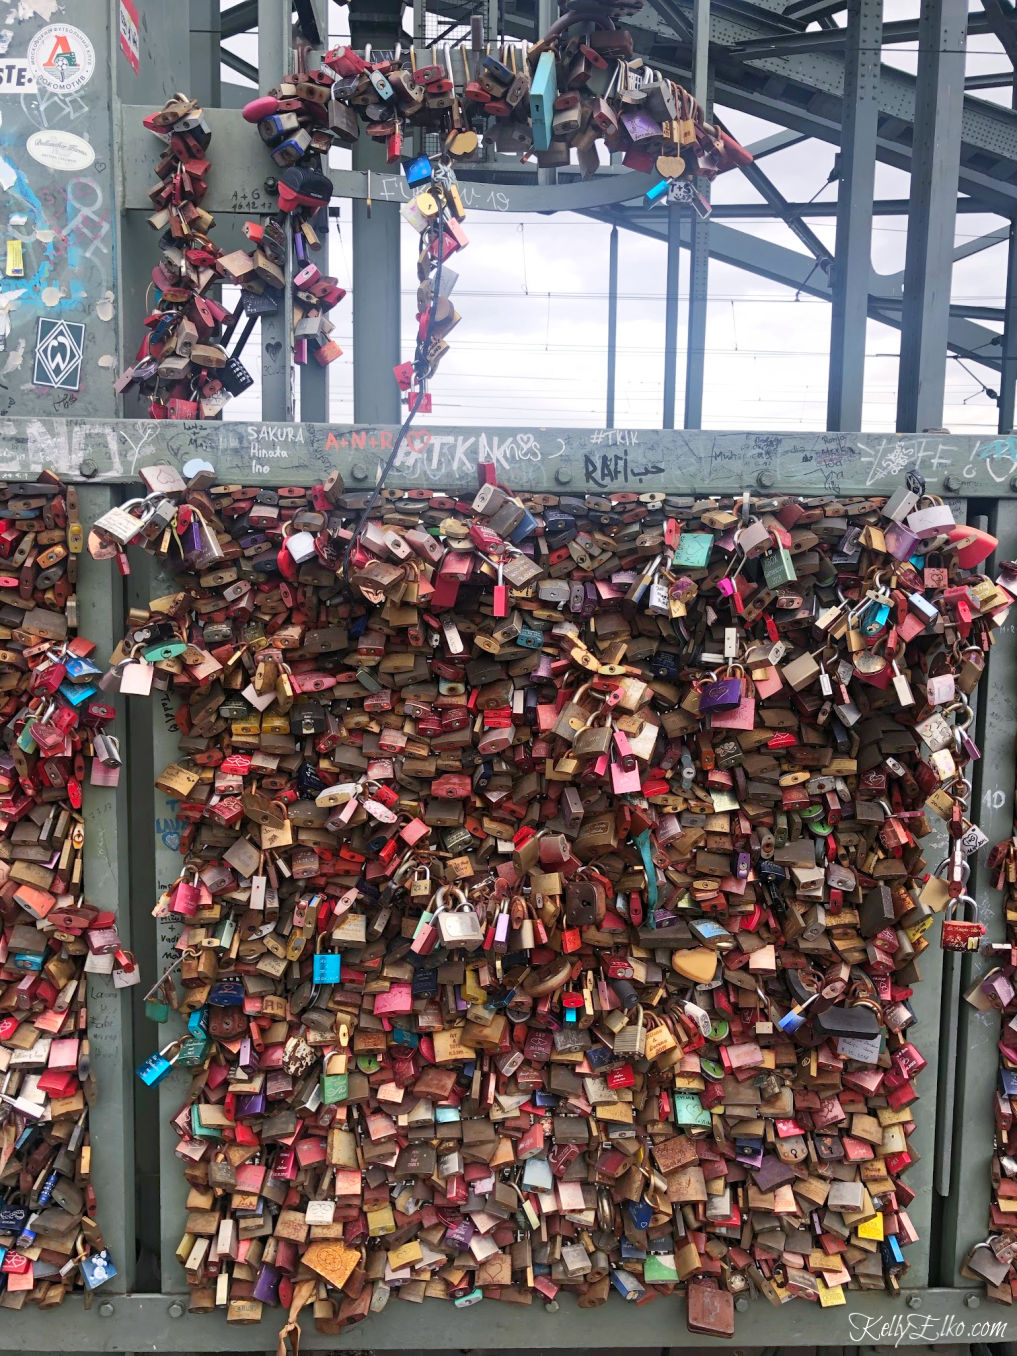 Love Locks bridge in Cologne Germany kellyelko.com #lovelocksbridge #colognegermany #travel #rivercruise #rhineriver